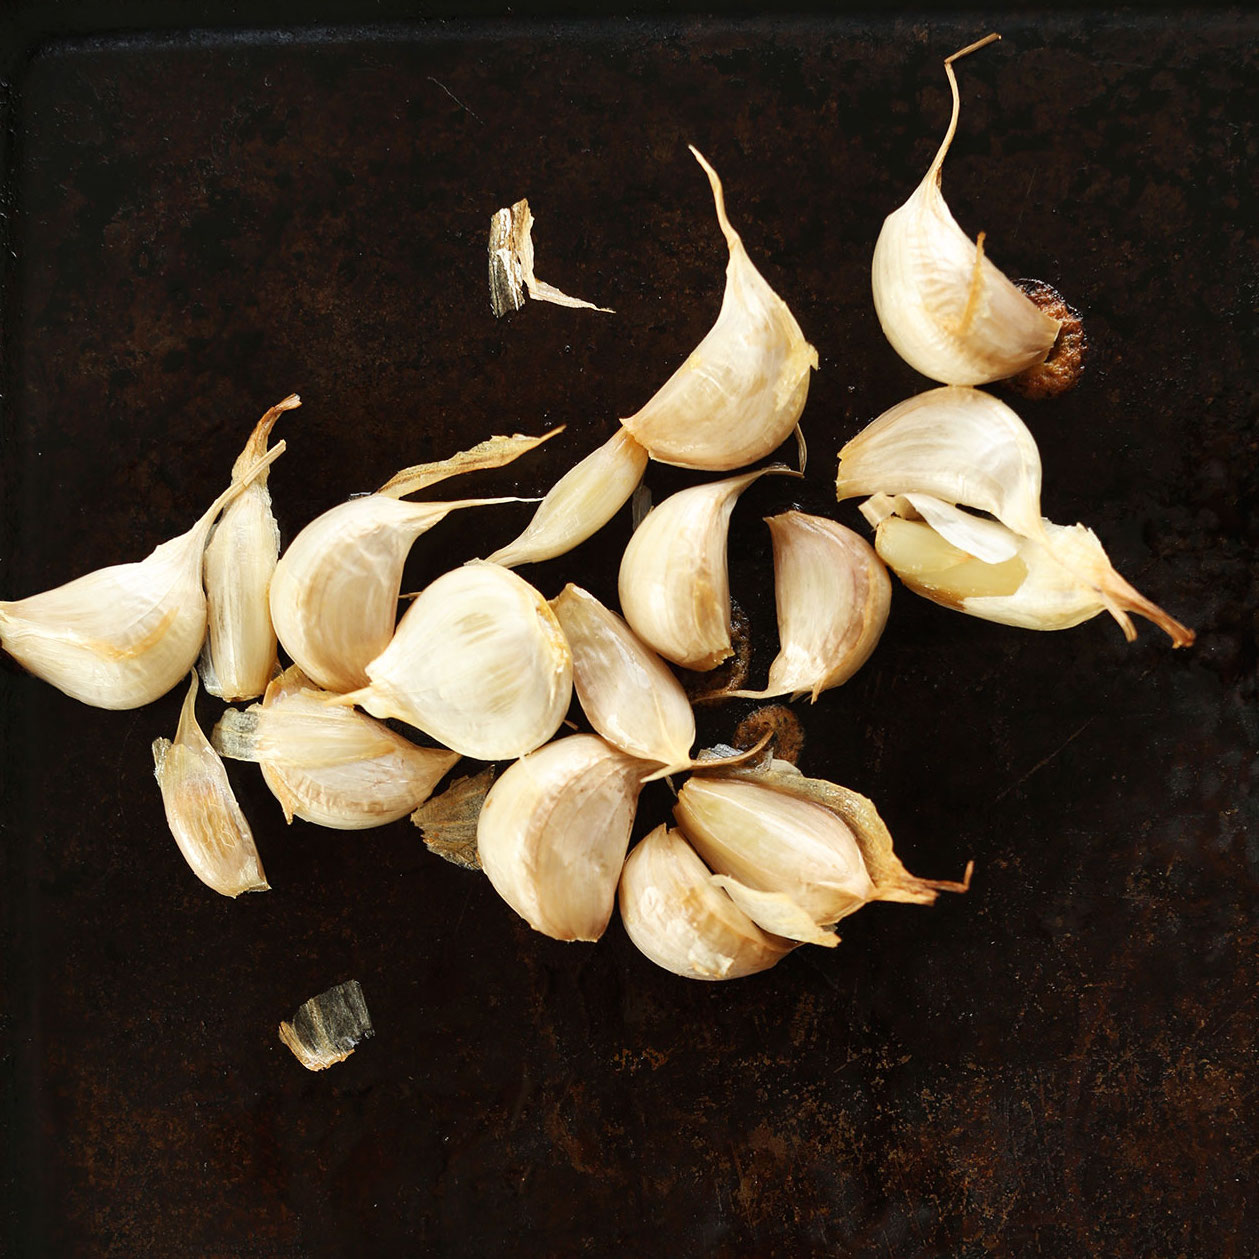 Benefits of garlic in a human body